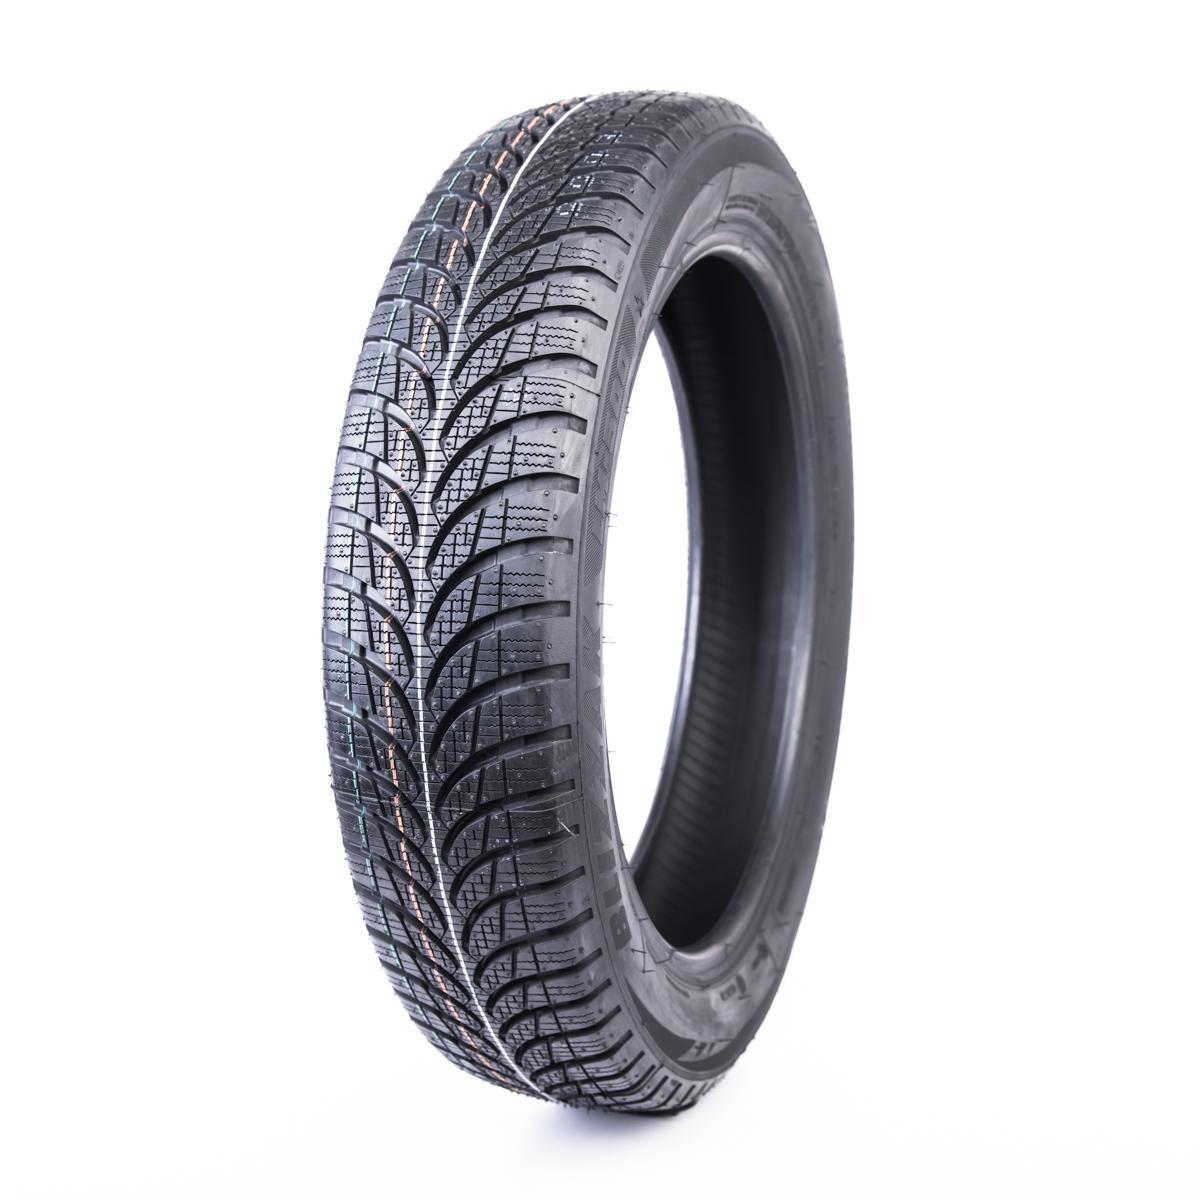 Bridgestone, BLIZZAK LM500 Vinter 95758